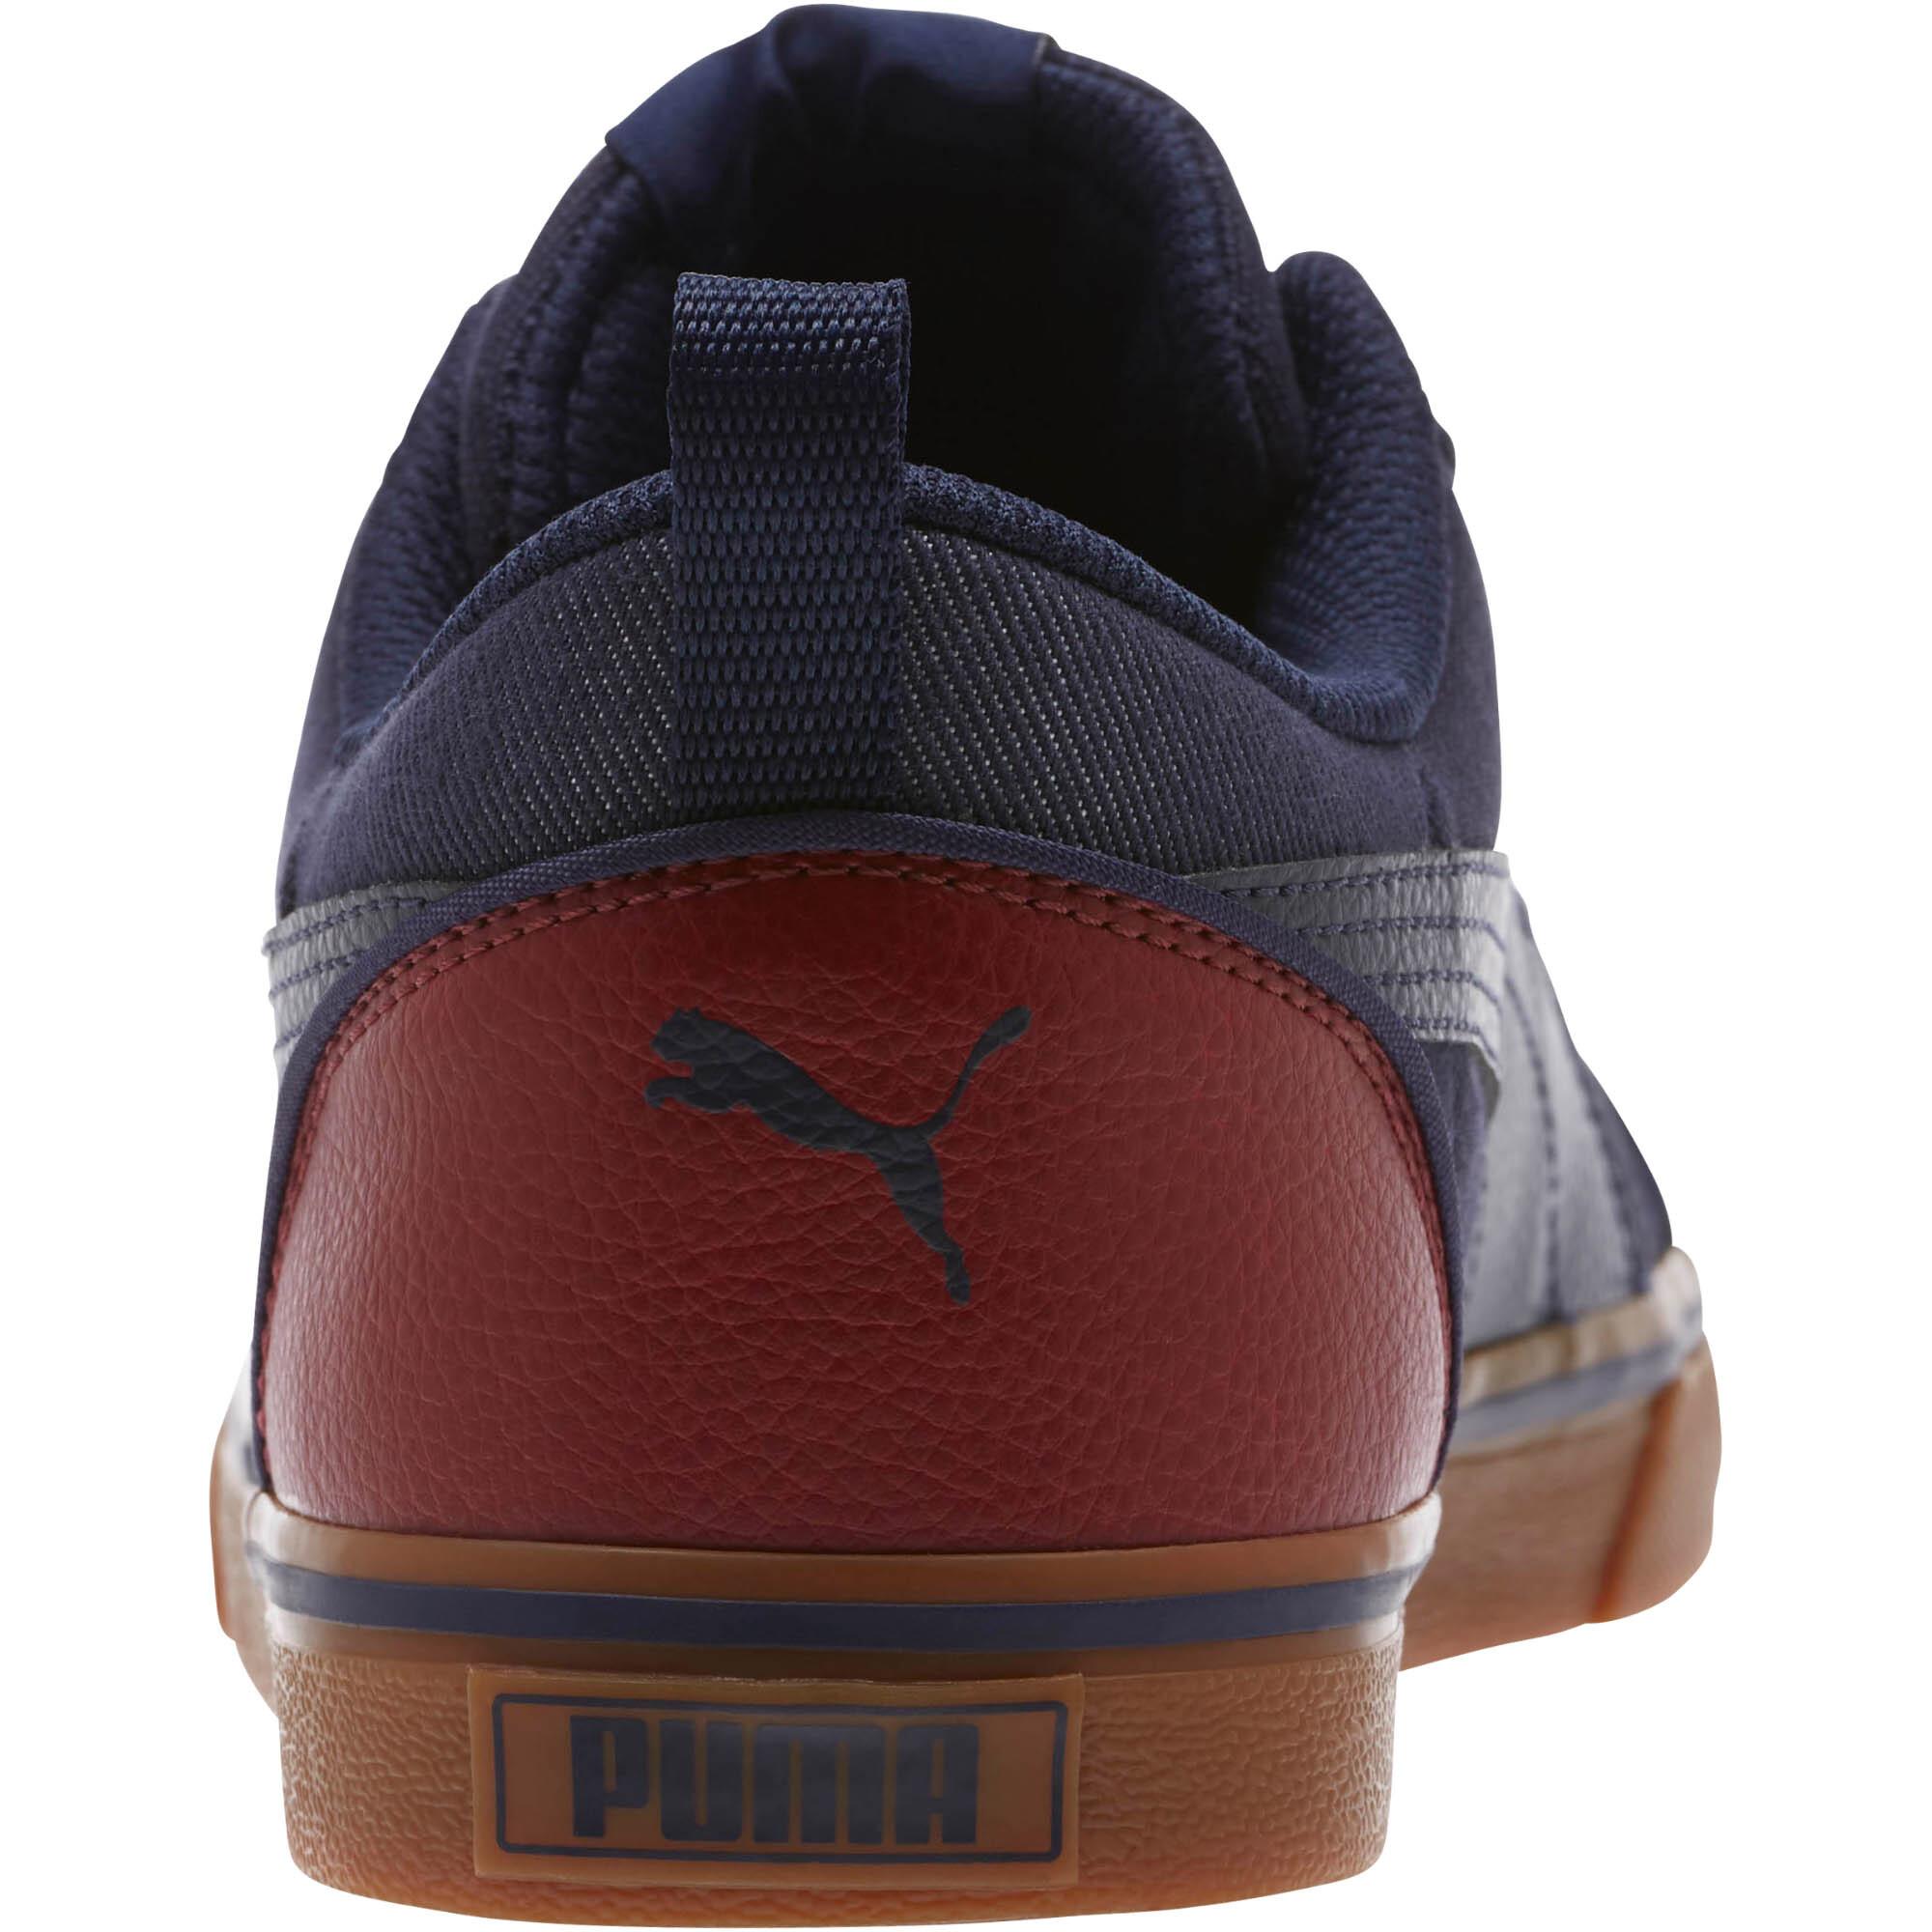 PUMA-PUMA-Bridger-Men-039-s-Sneakers-Men-Shoe-Basics thumbnail 14